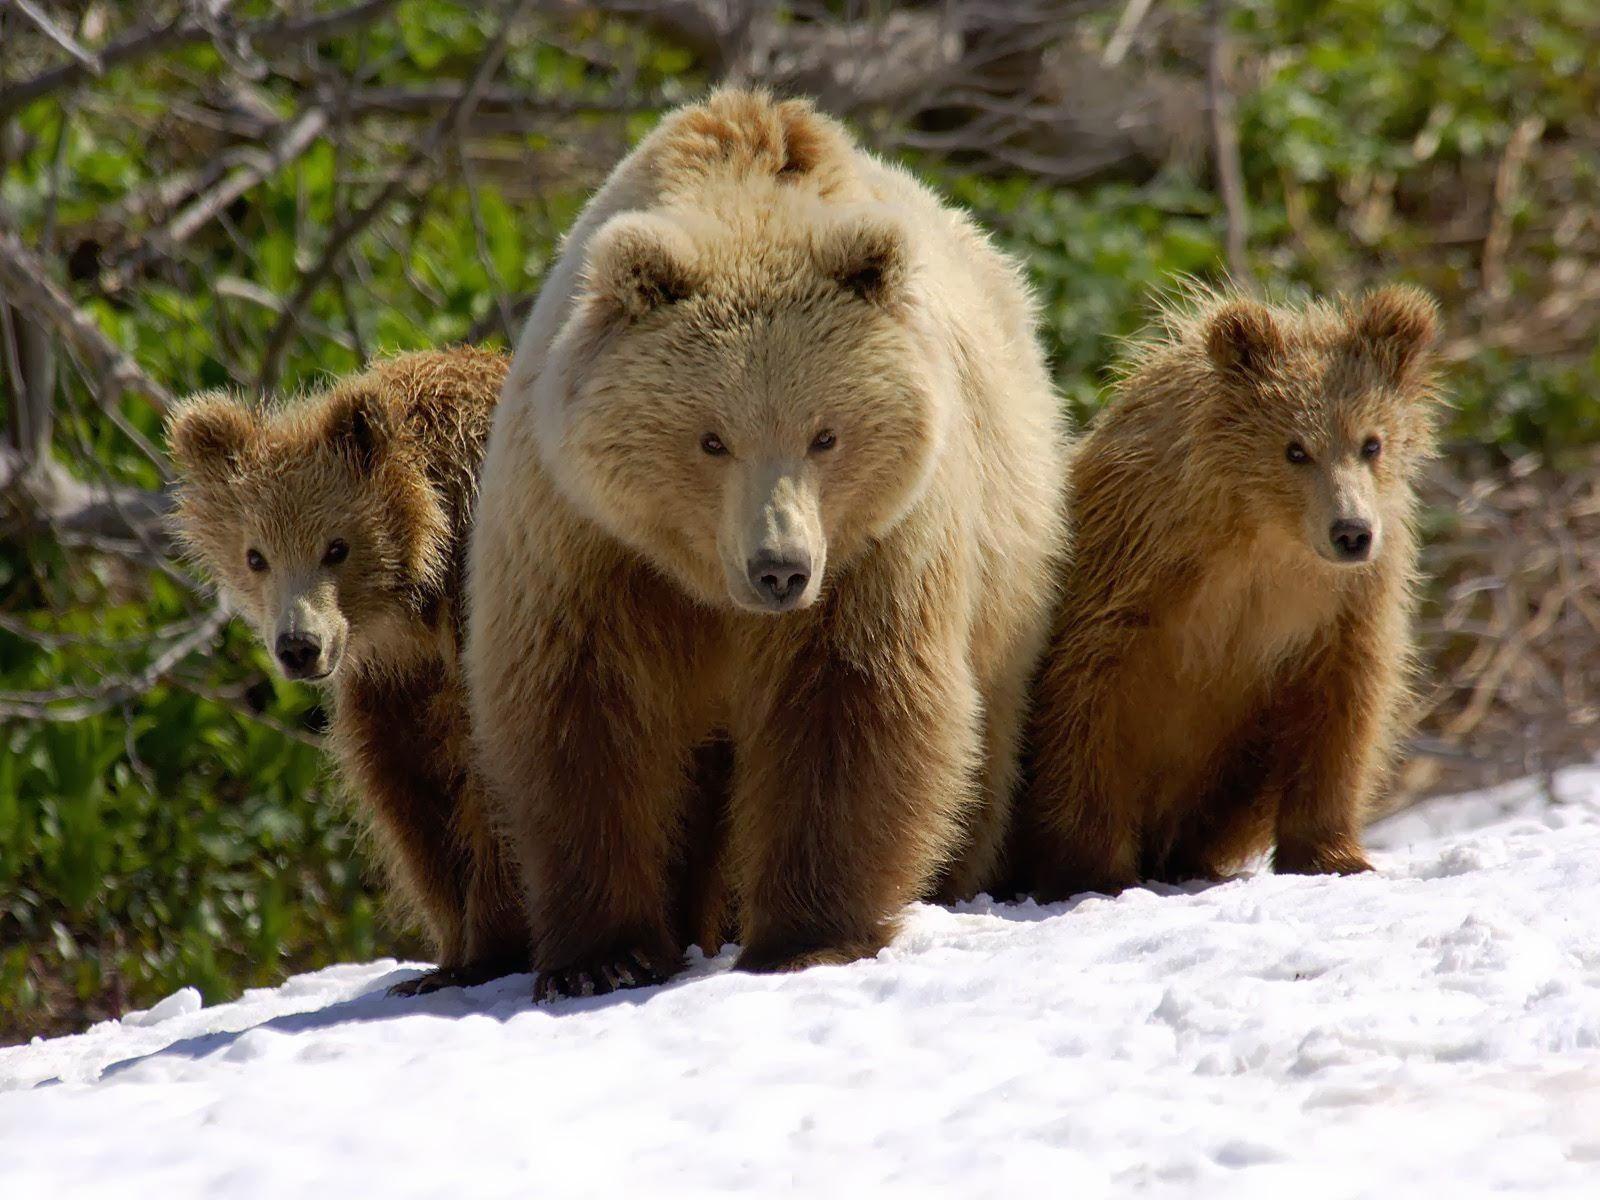 Brown Bear Images